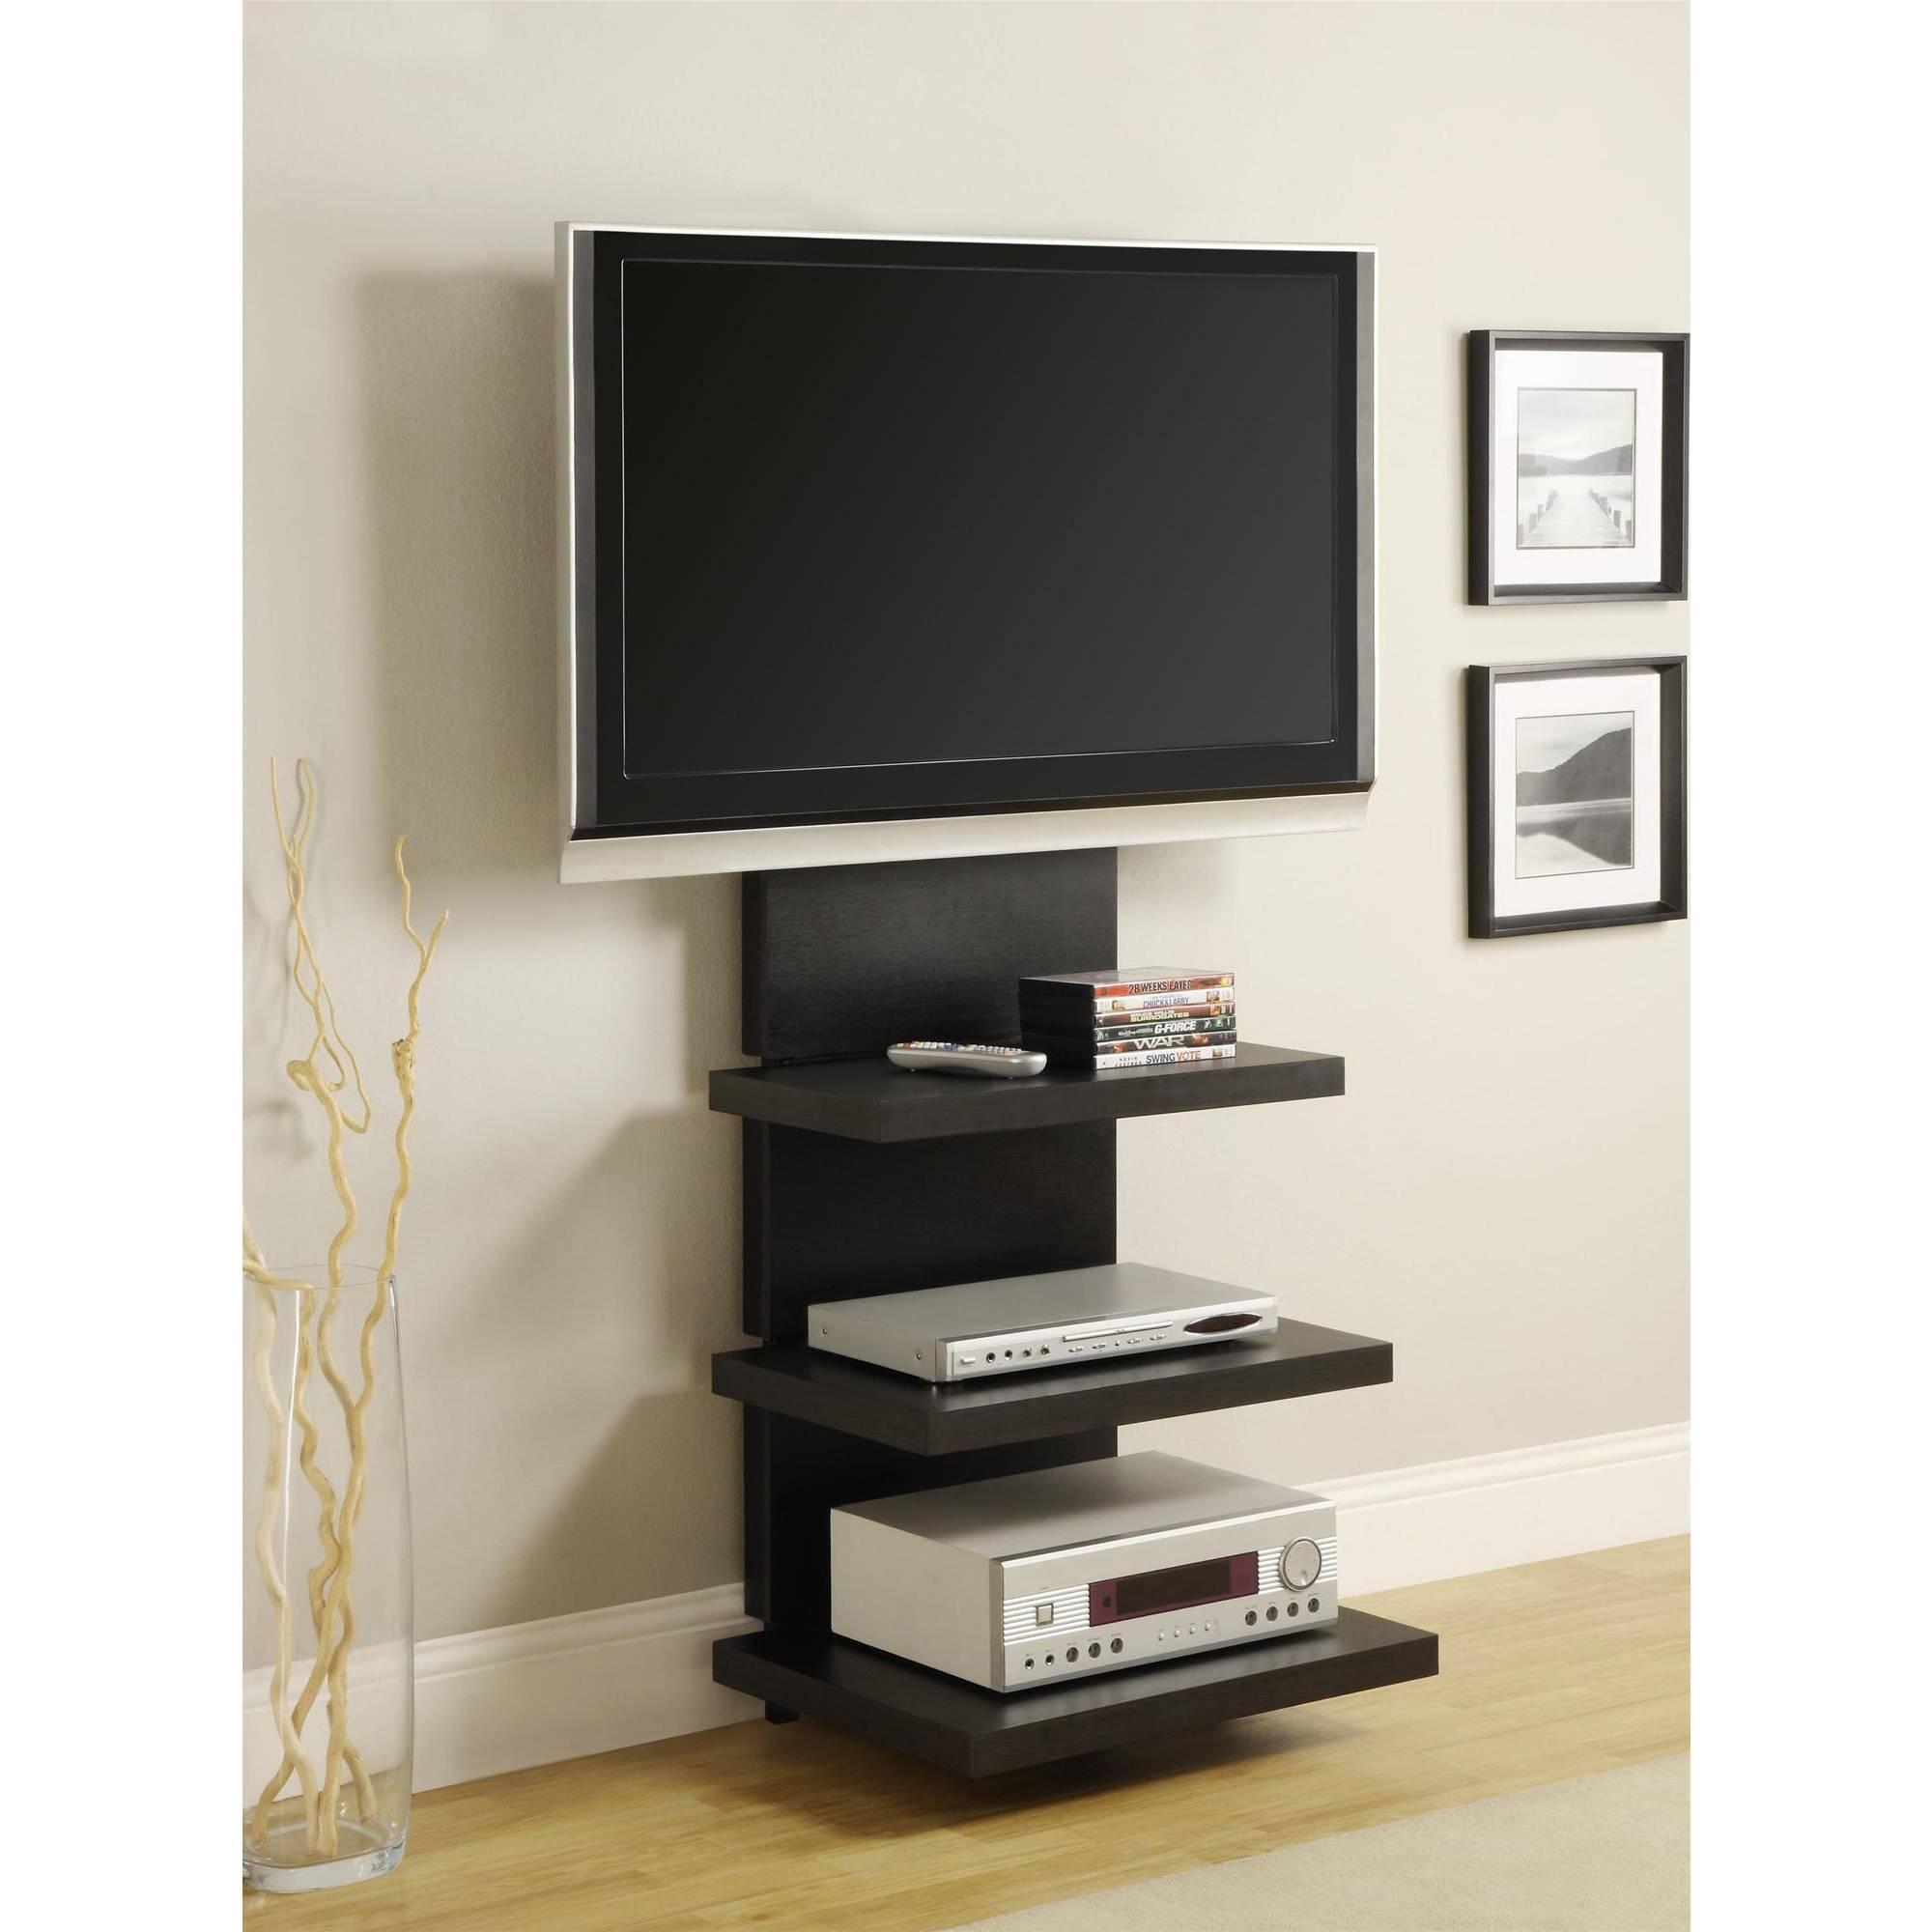 Tv : 24 Inch Corner Tv Stands Finest 24 Inch Corner Tv Stands in 24 Inch Corner Tv Stands (Image 8 of 15)